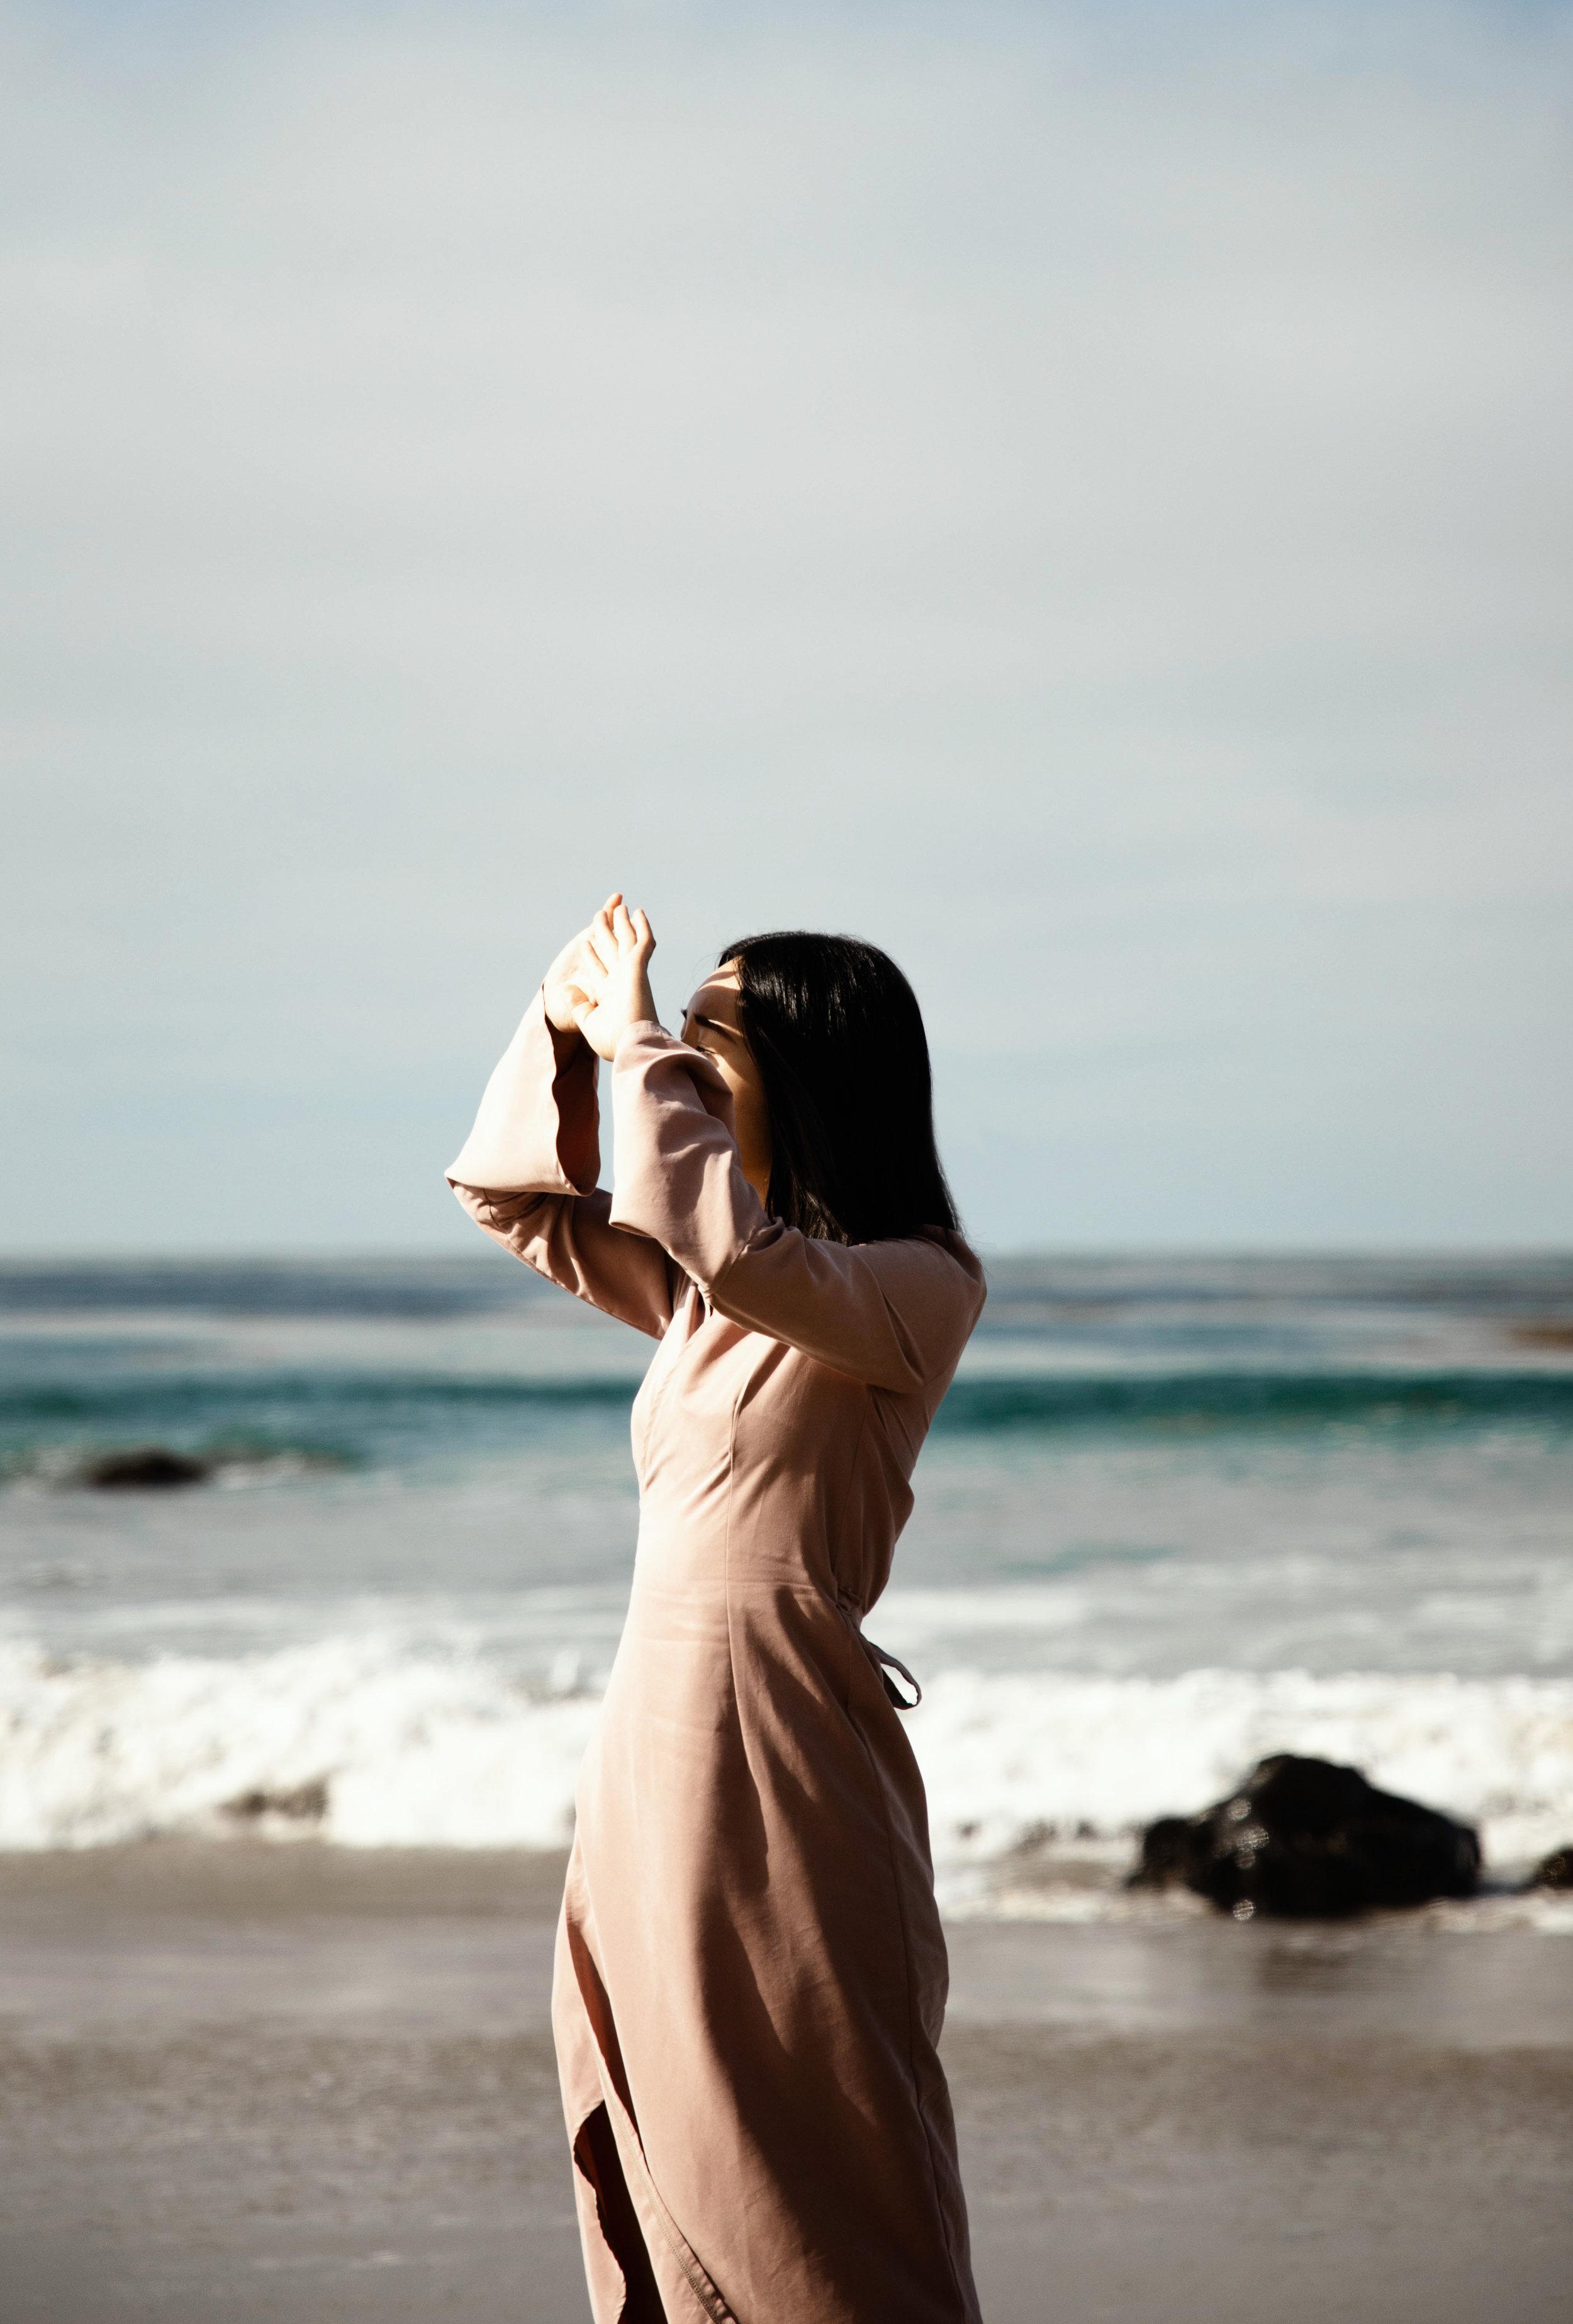 sarina_beach_13.jpg